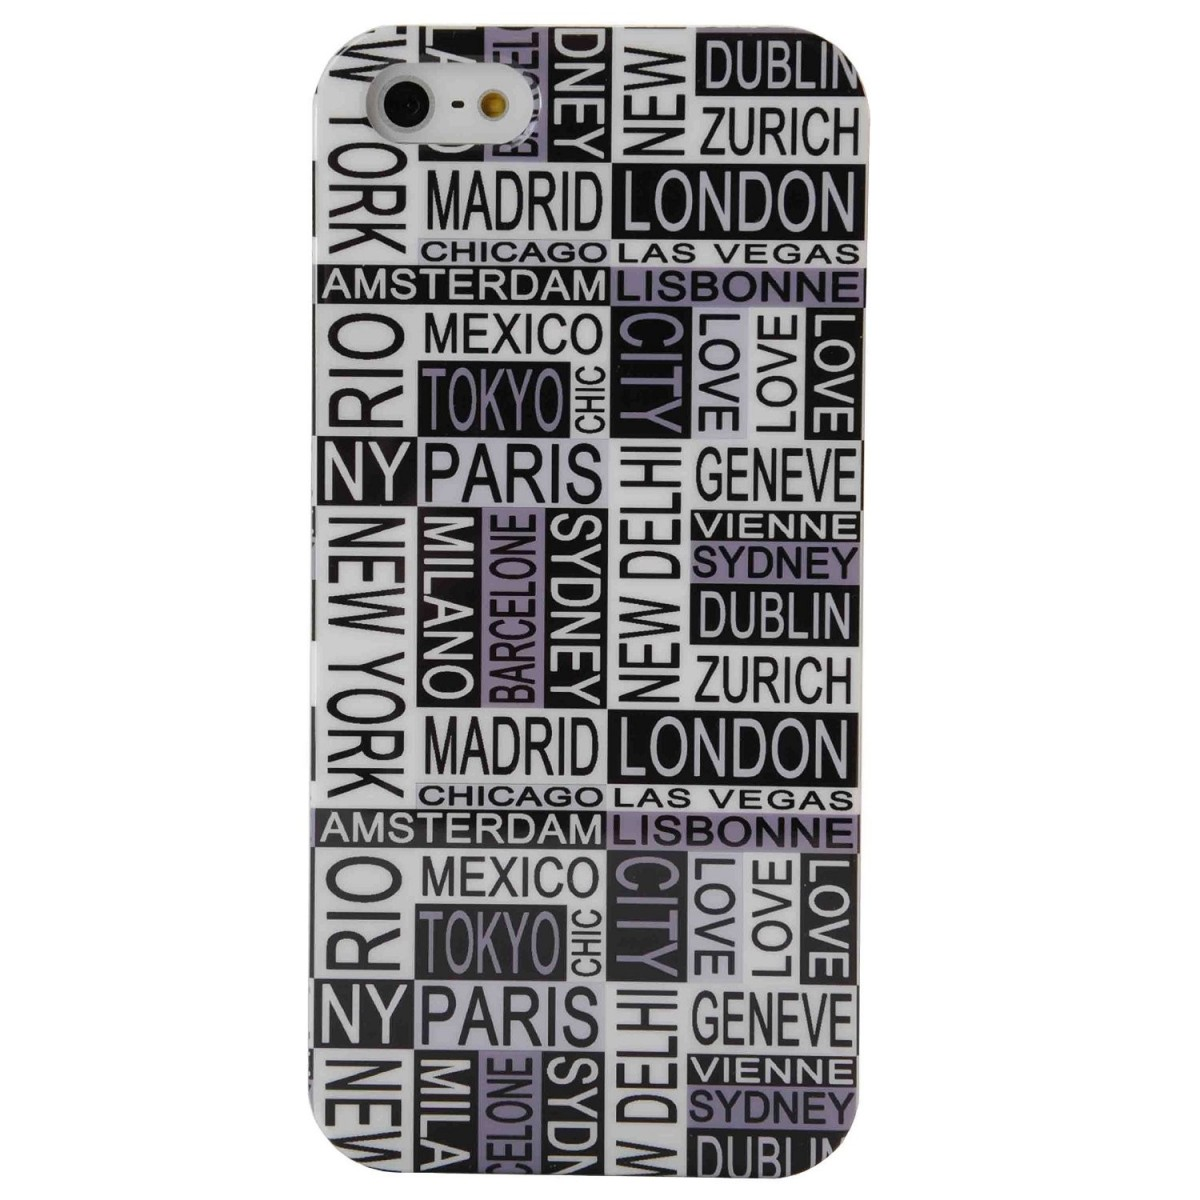 Coque iPhone SE / 5 / 5S modèle Love My City - Akashi